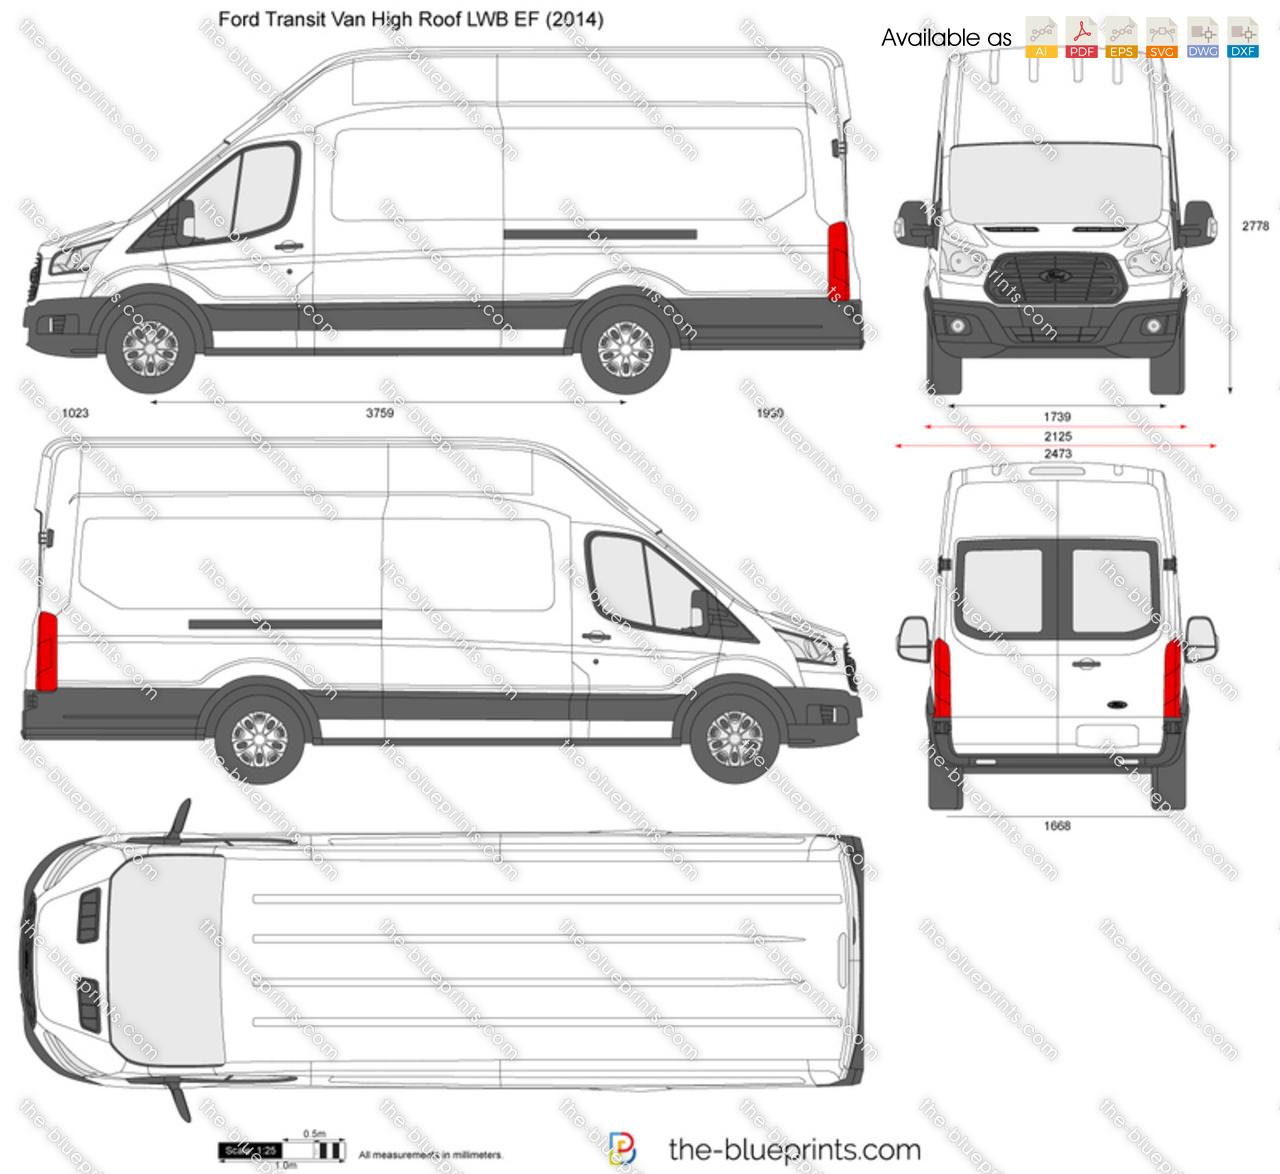 hight resolution of ford van diagram wiring diagram img ford e350 van wiring diagram ford transit diagram wiring diagram